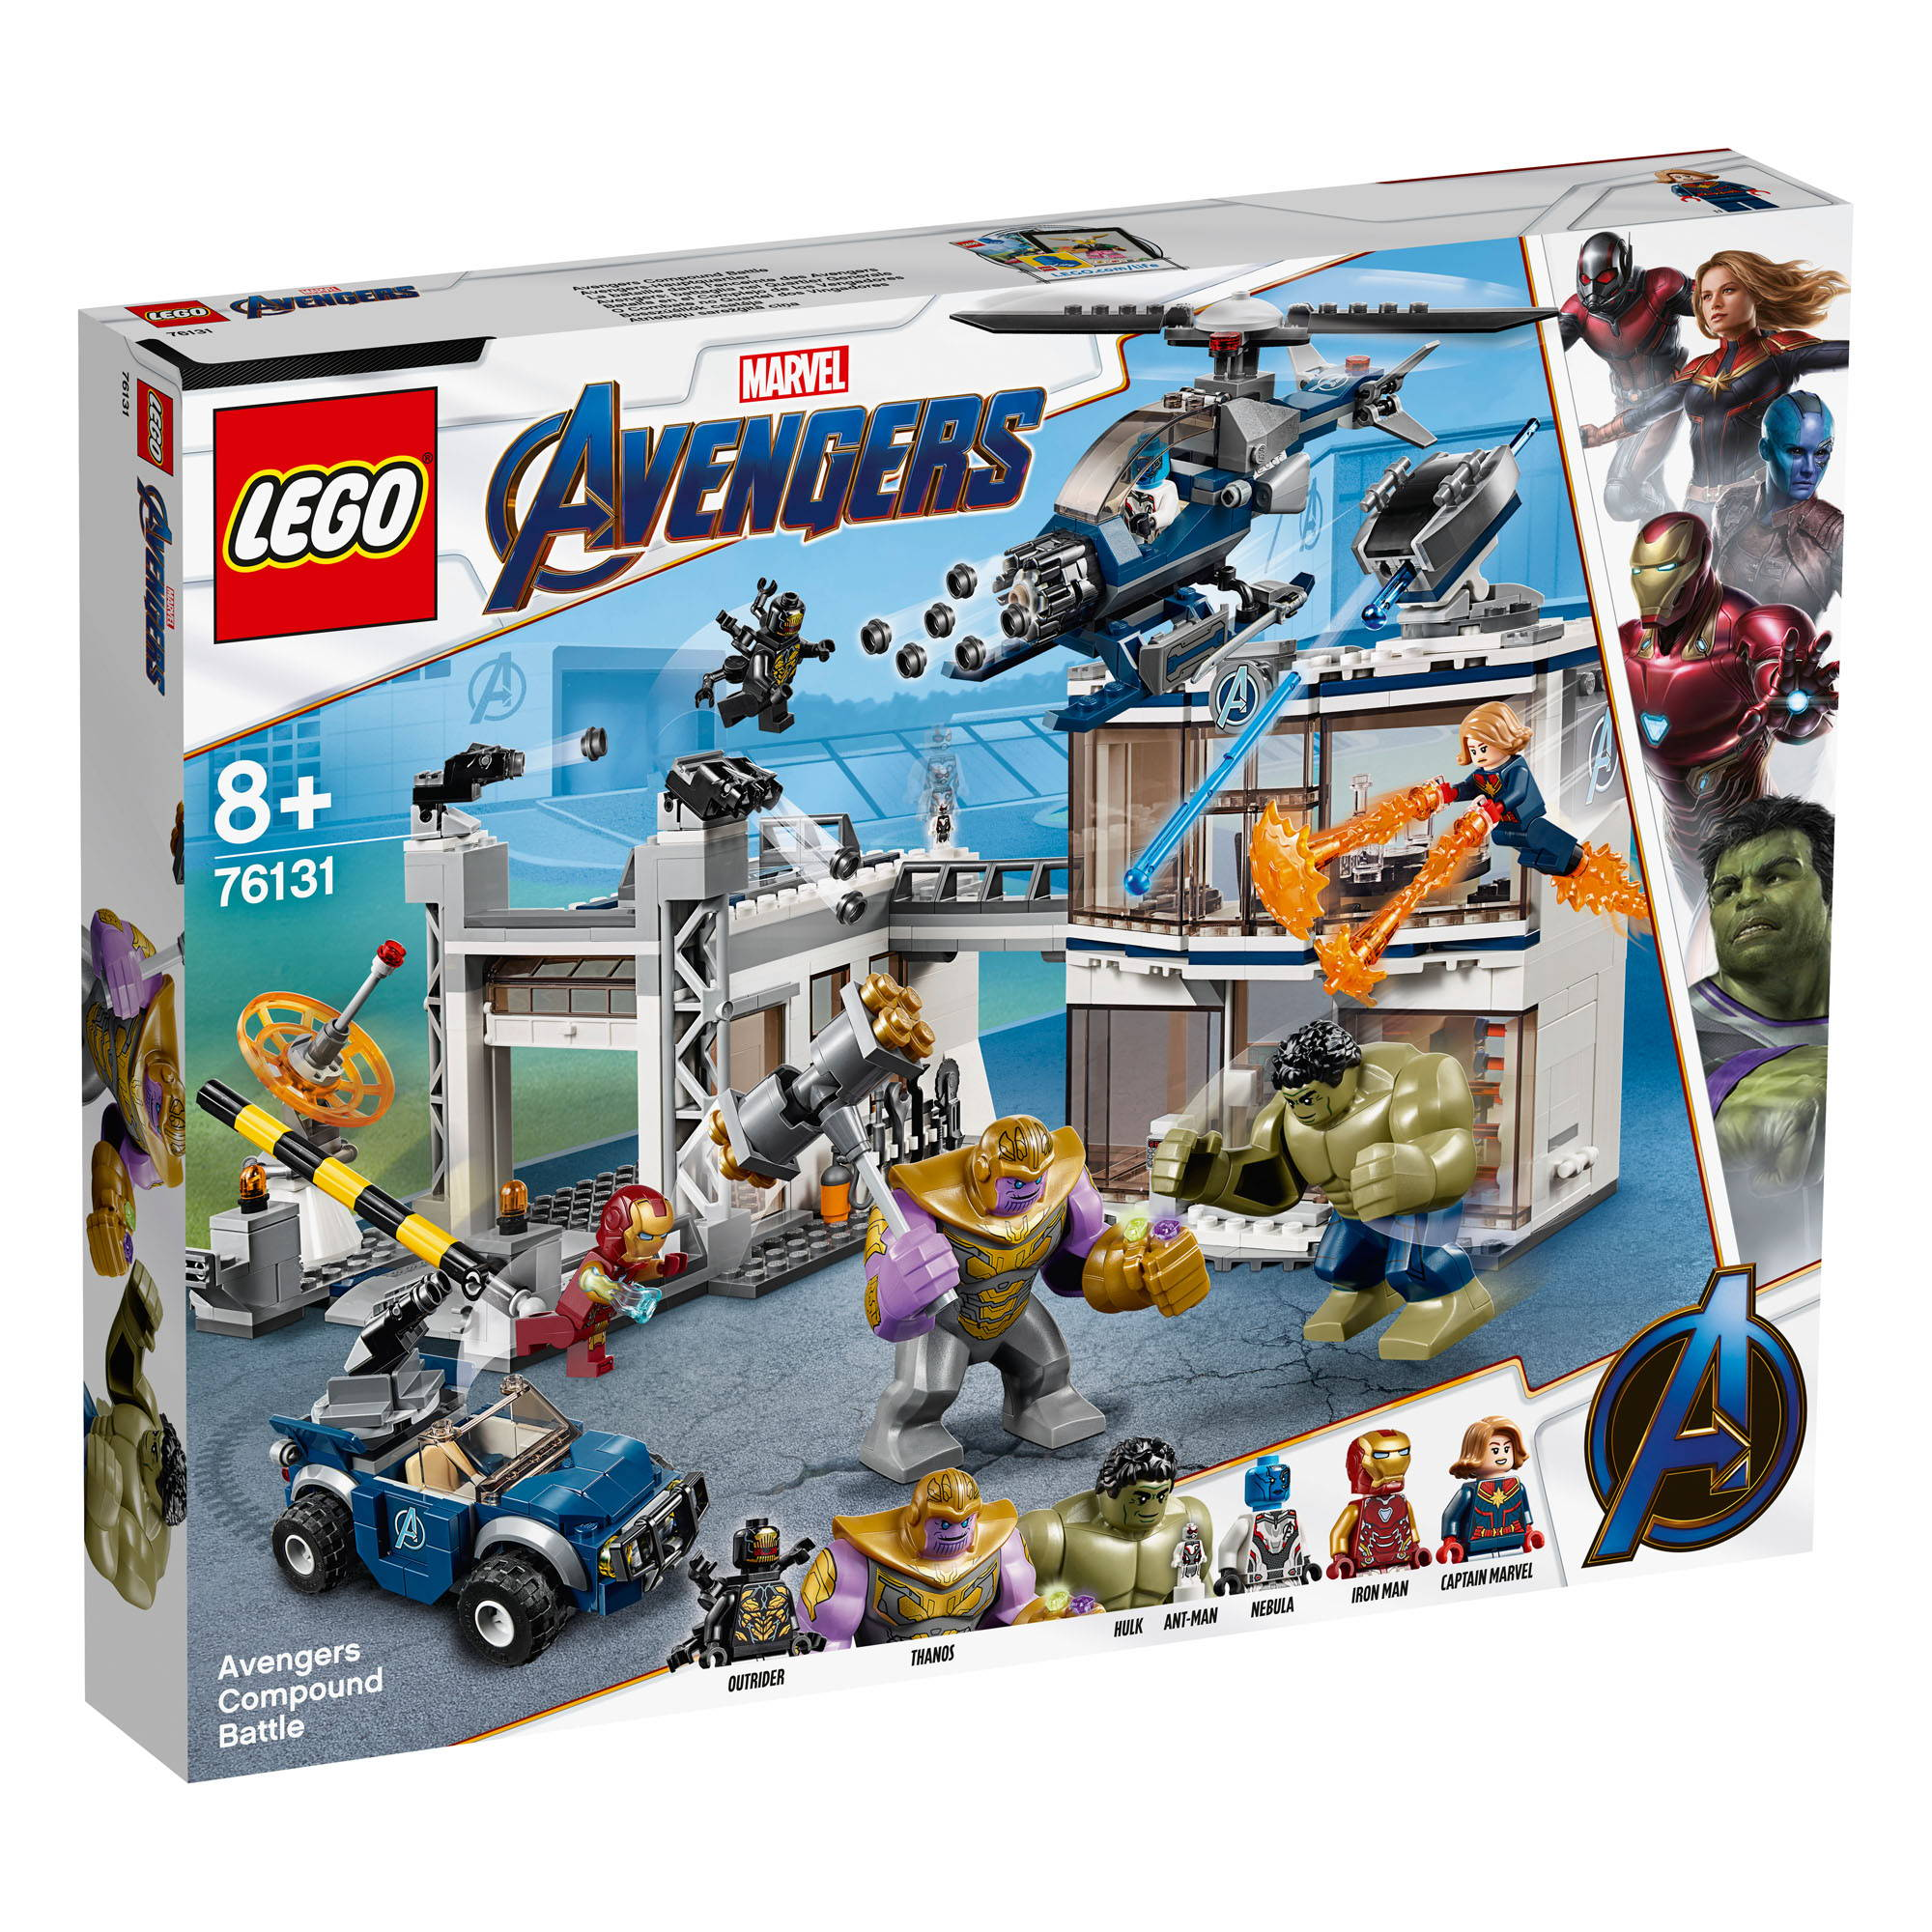 LEGO AVENGERS COMPOUND BATTLE